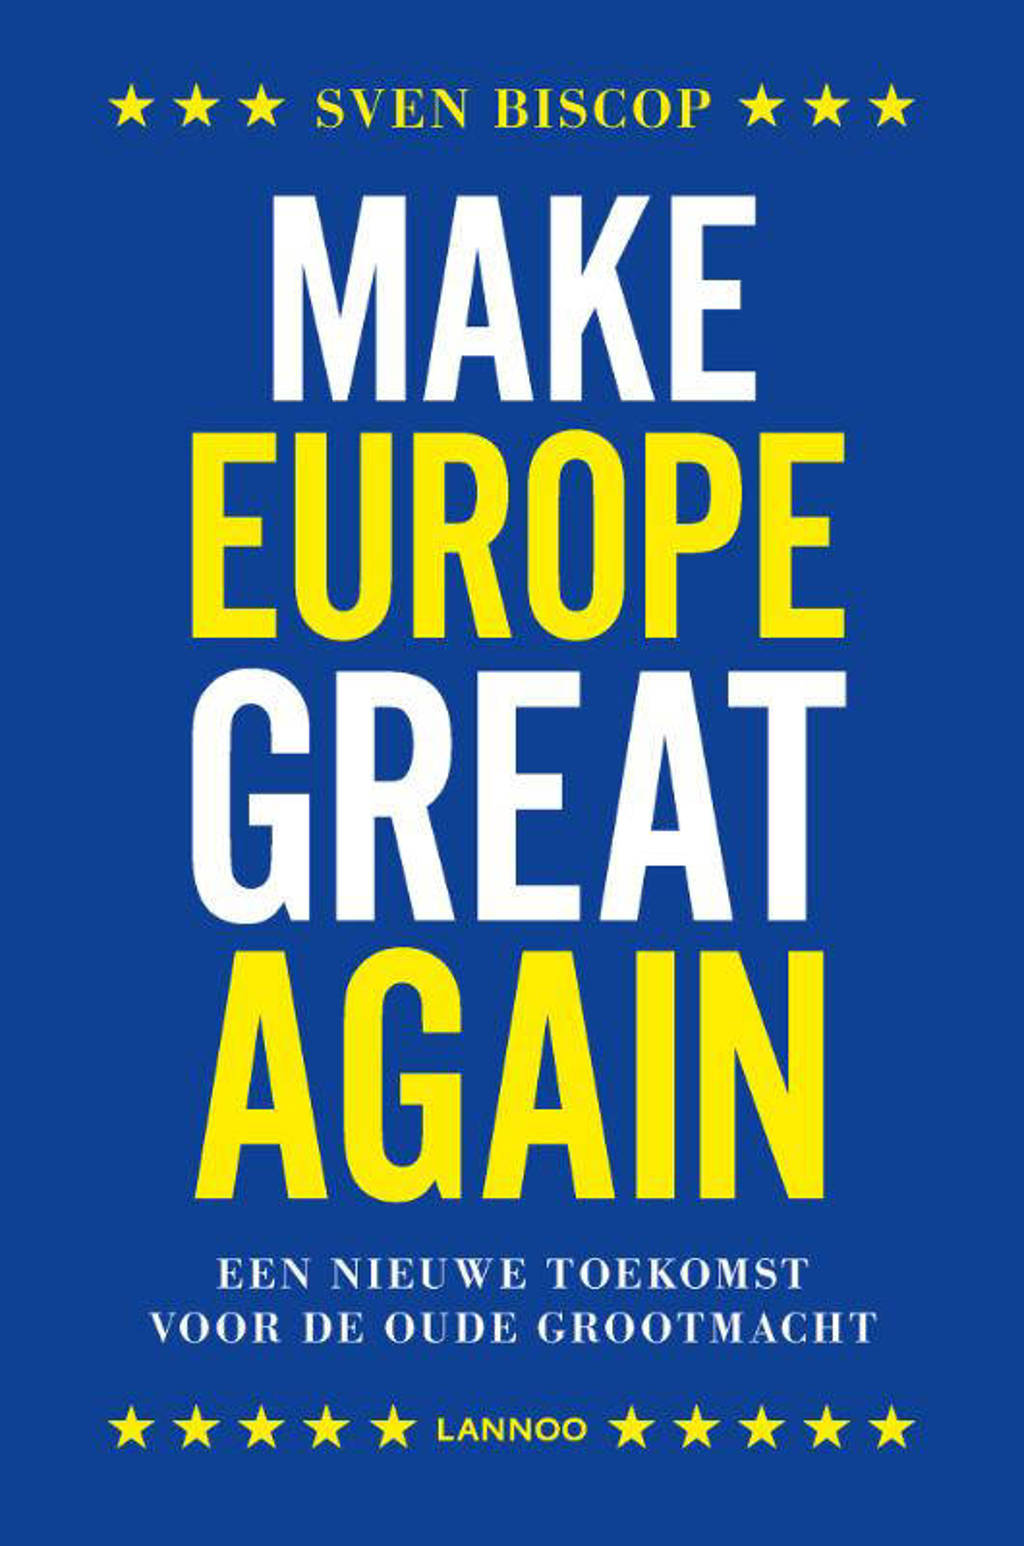 Make Europe great again - Sven Biscop